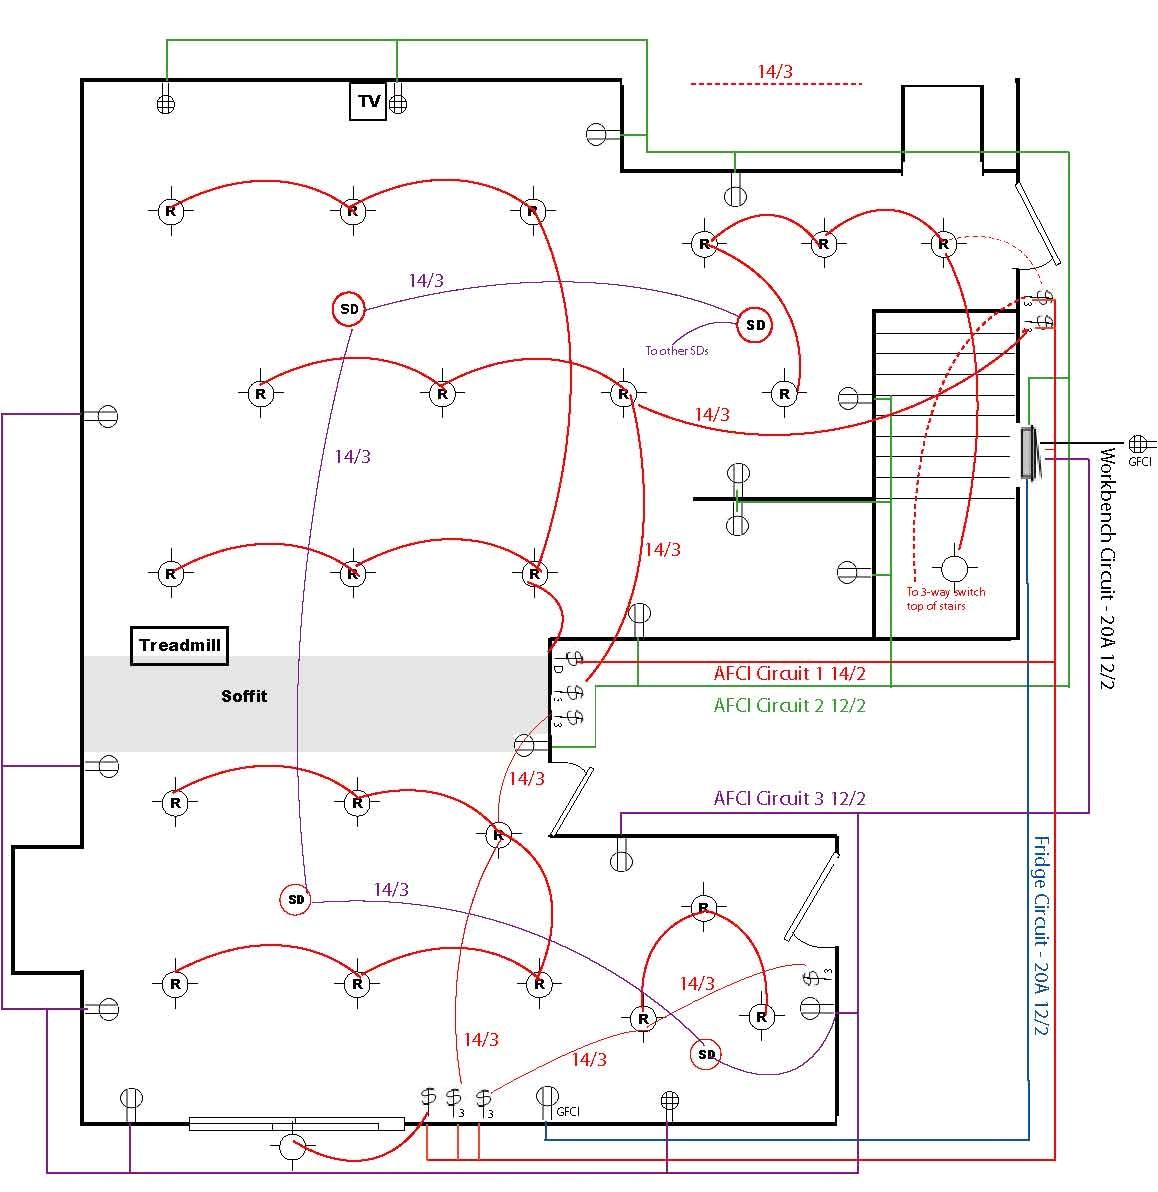 house wiring diagram in pdf wiring diagram sheetelectrical house wiring pdf wiring diagram blog house wiring